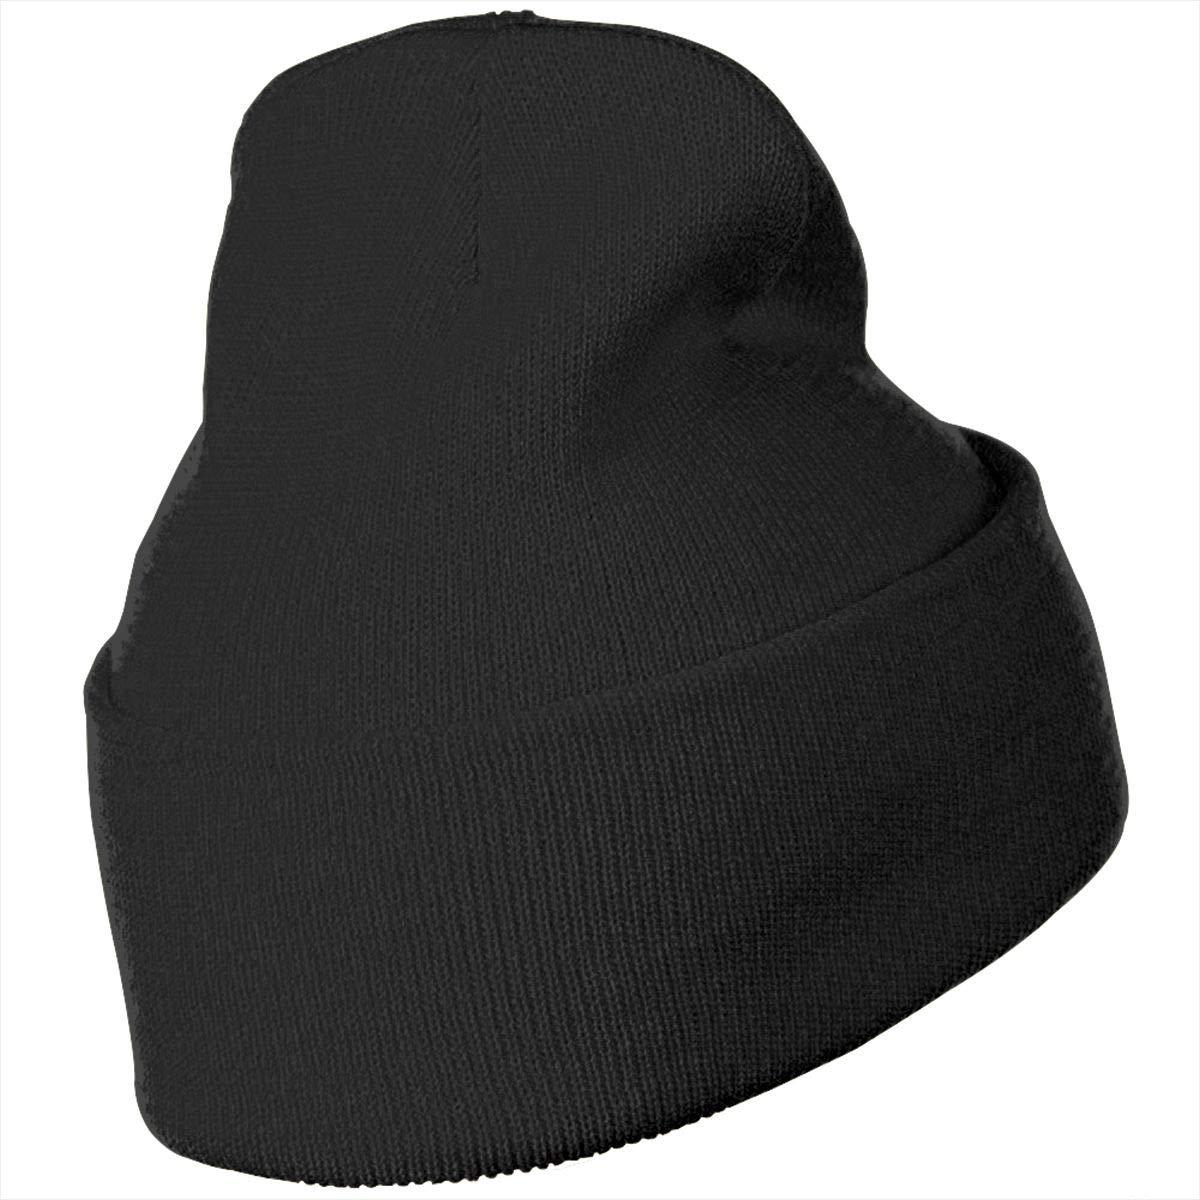 QZqDQ Cool Lion Unisex Fashion Knitted Hat Luxury Hip-Hop Cap